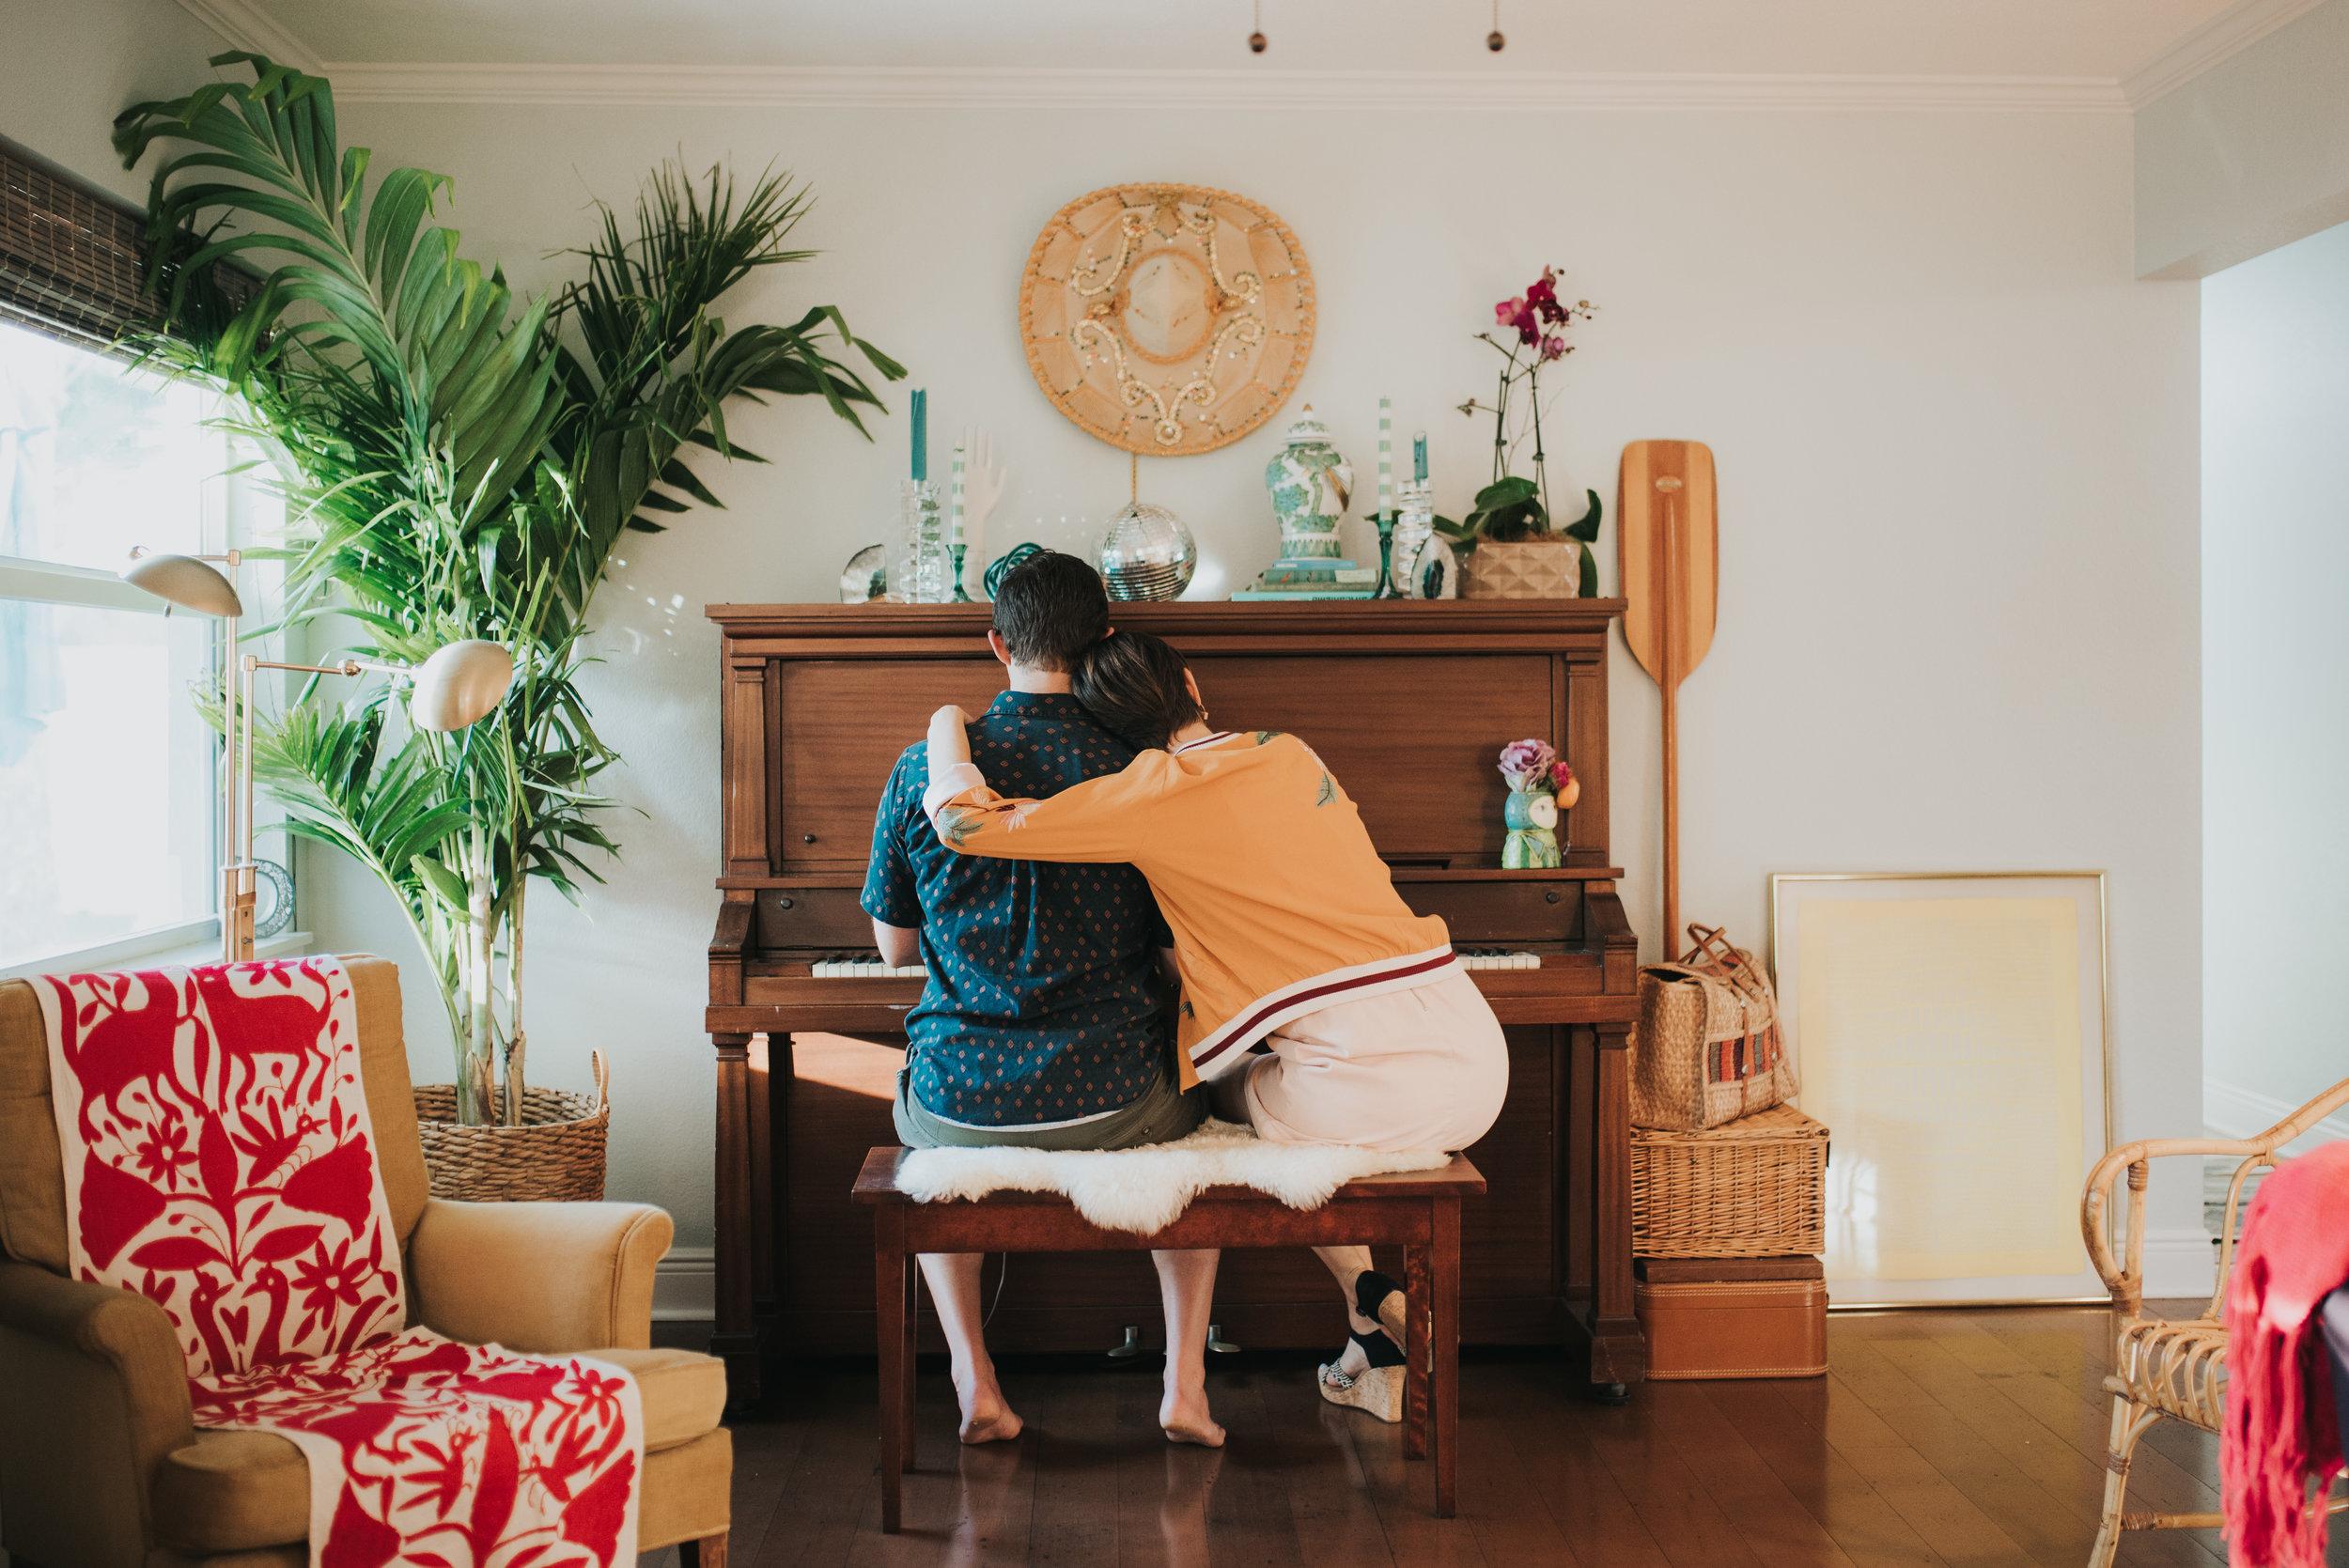 carissa-spencer-mid-century-editorial-in-home-couple-session-orlando-florida-245.jpg